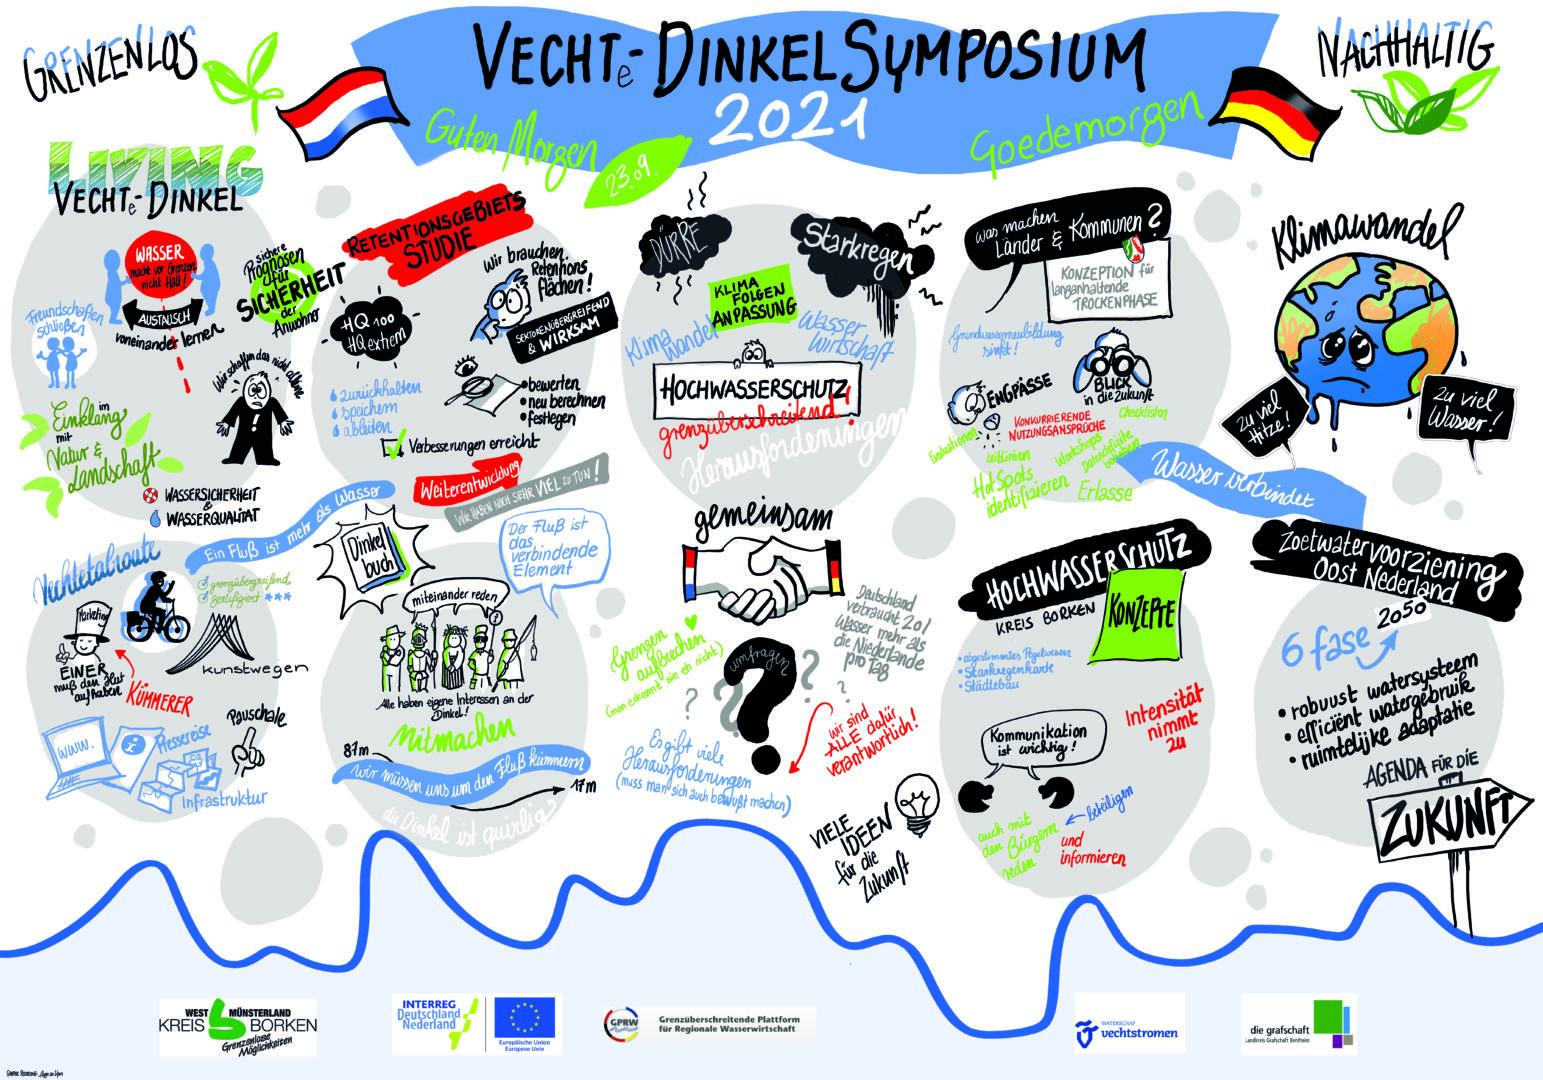 INTERREG Digitaal Vecht Dinkel Symposium 1 ©Dagmar Gosejacob